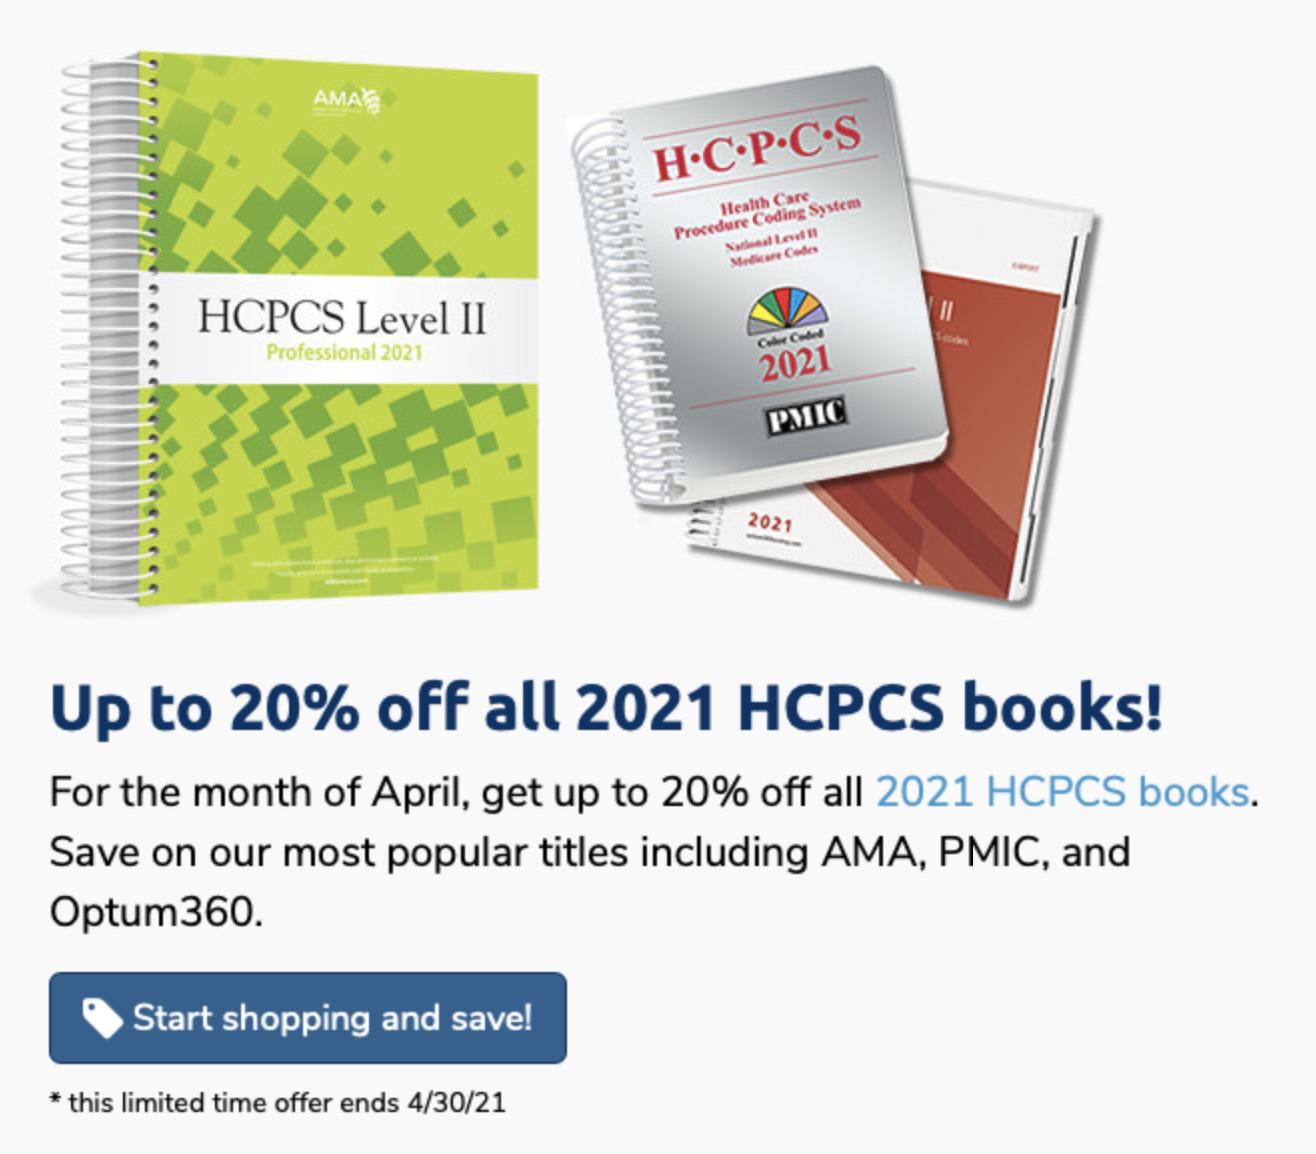 Up to 20% 2021 HCPCS Books